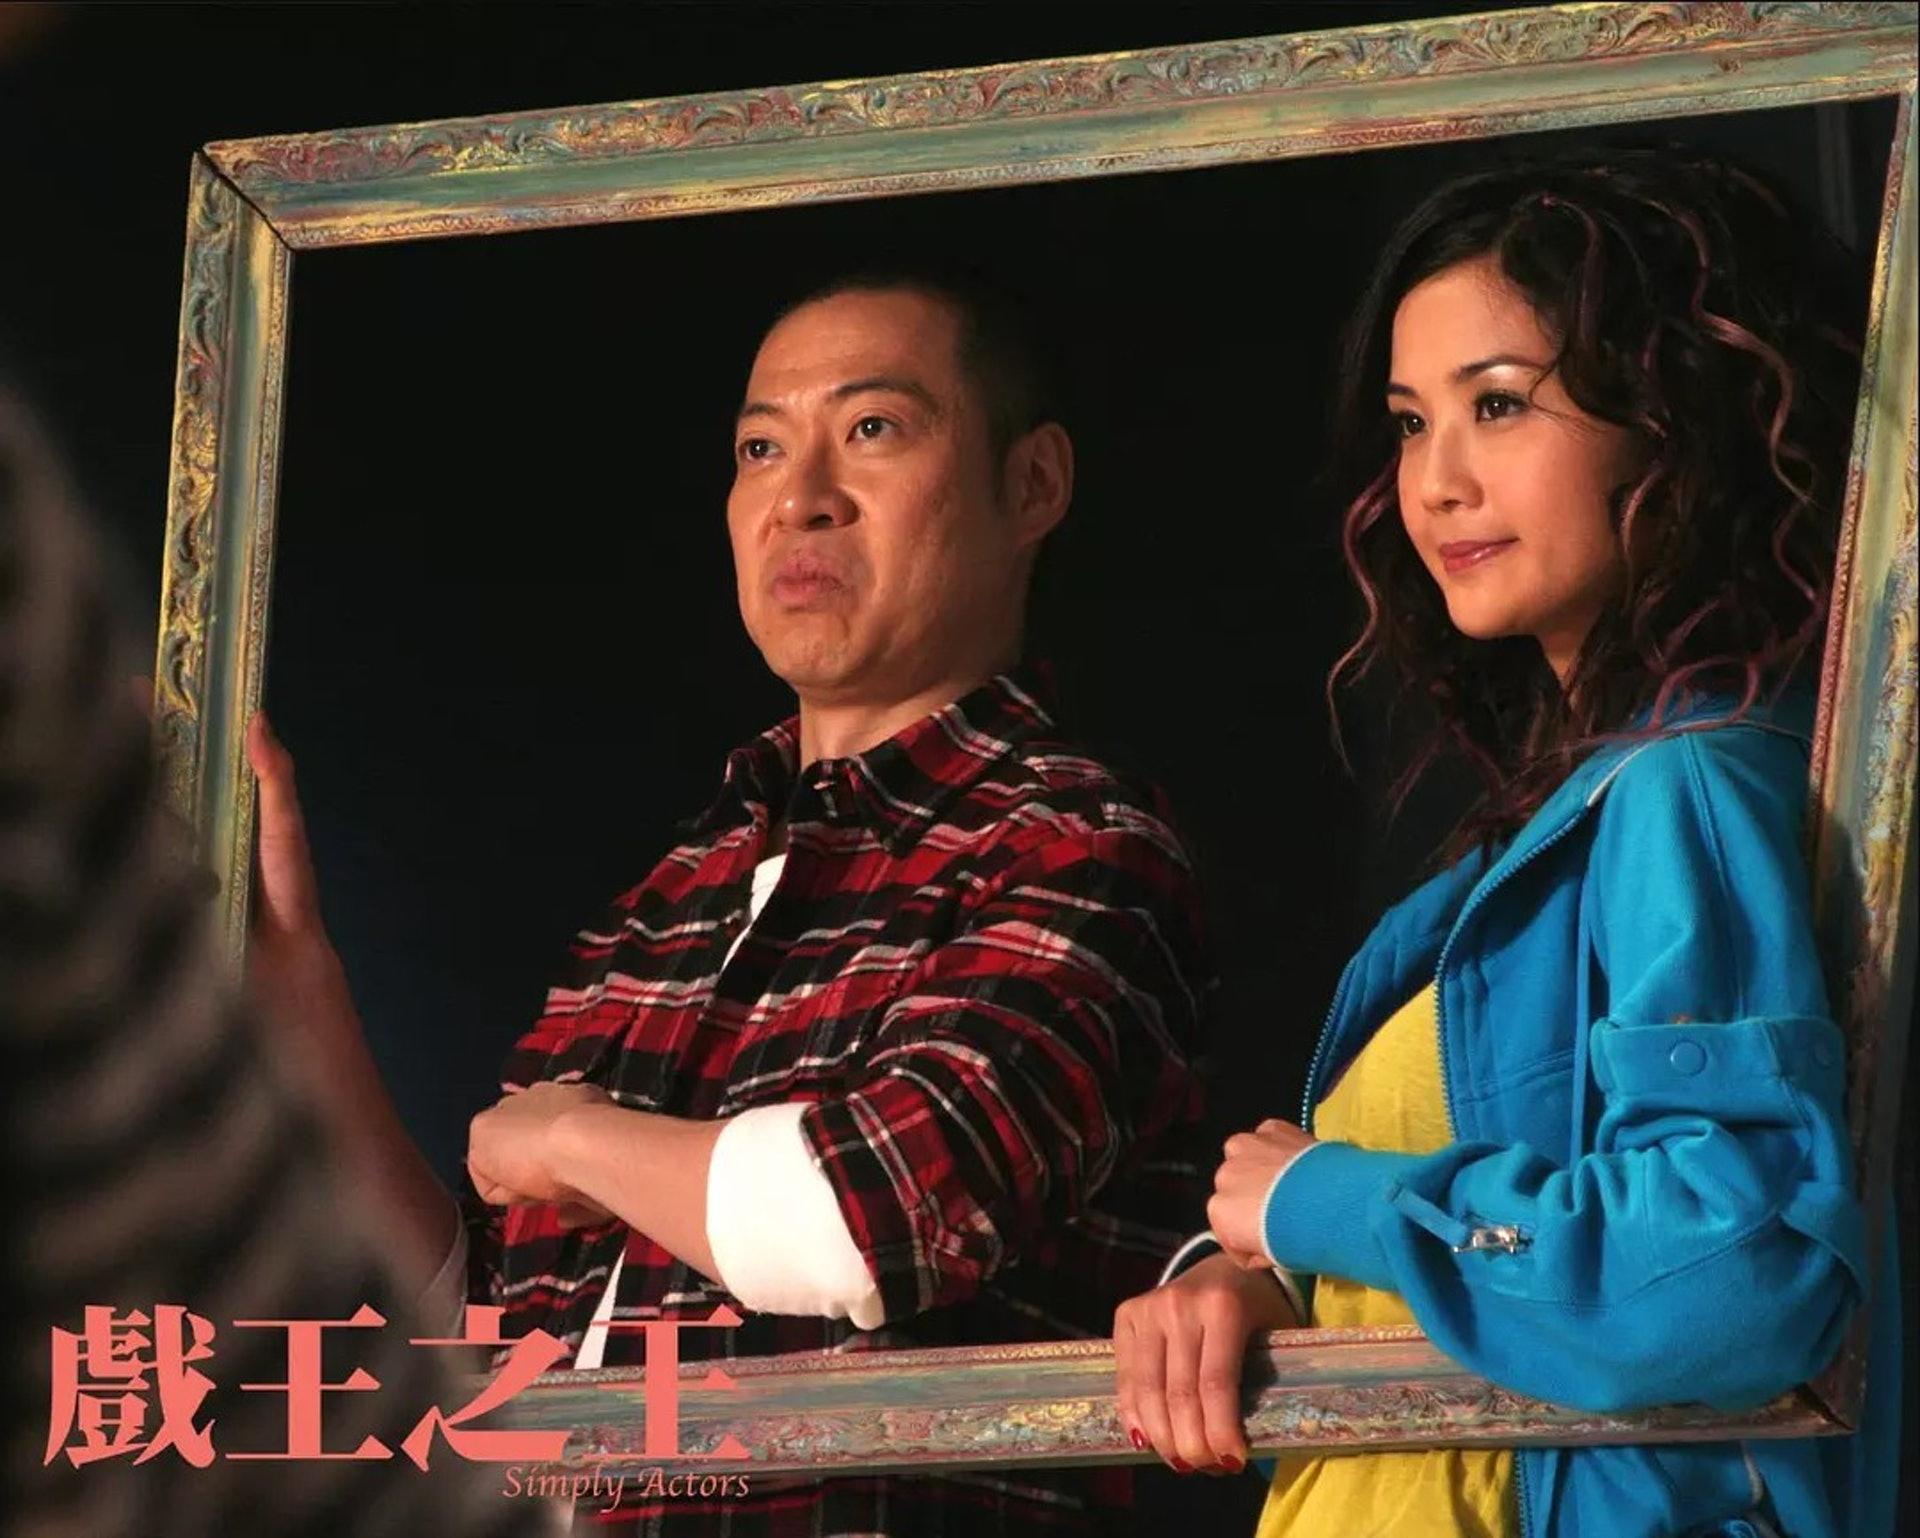 Golden Scene 高先電影院 電影發行 戲王之王 詹瑞文 蔡卓妍 阿sa